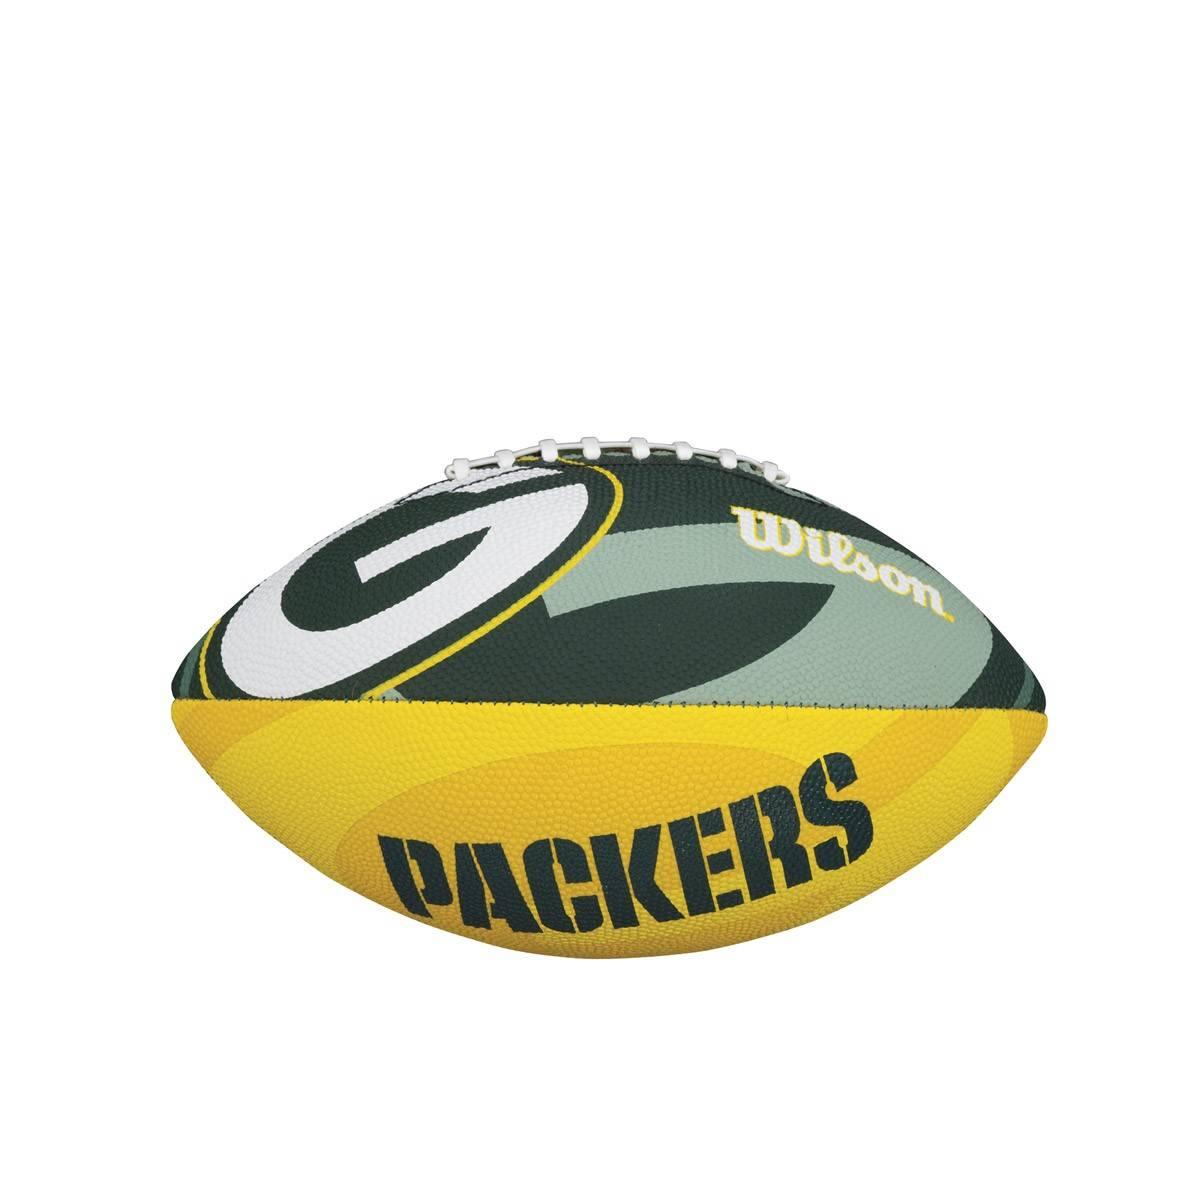 Wilson amerikkalainen jalkapallo NFL JR Team Green Bay Packers - Muu  palloilu - 883813846634 - 1. b0ed4c2318